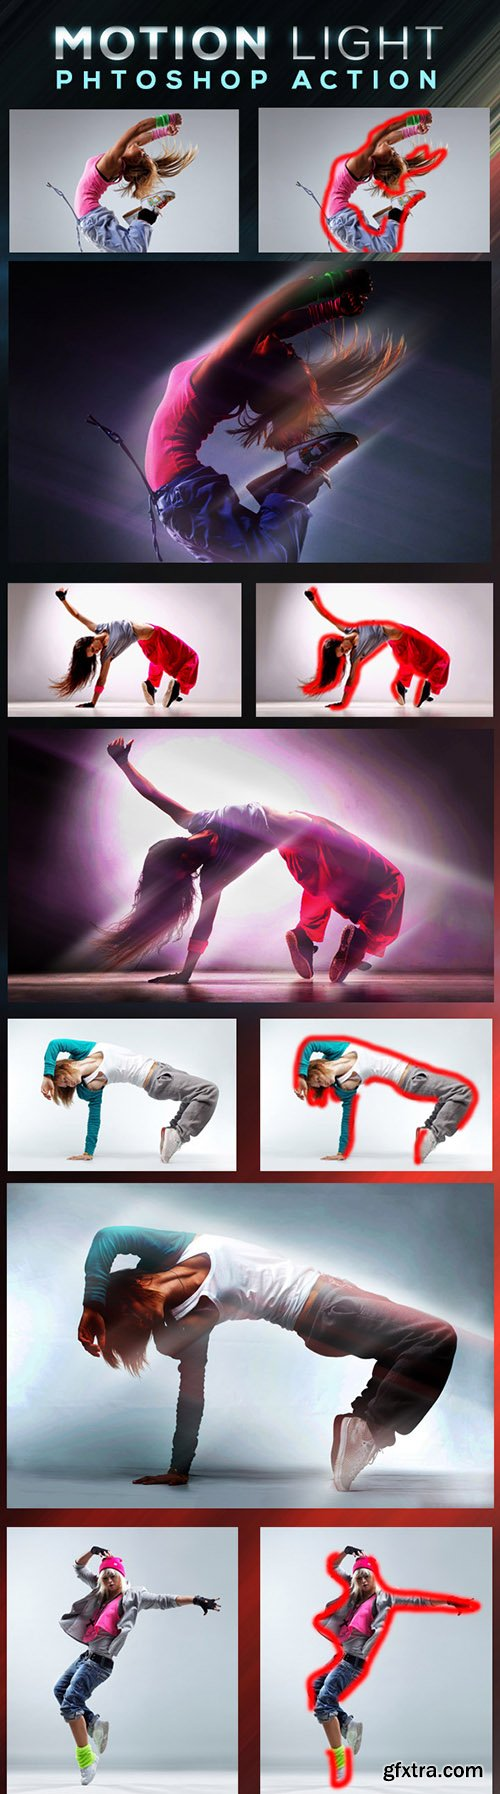 GraphicRiver Motion Light Photoshop Action 10735074